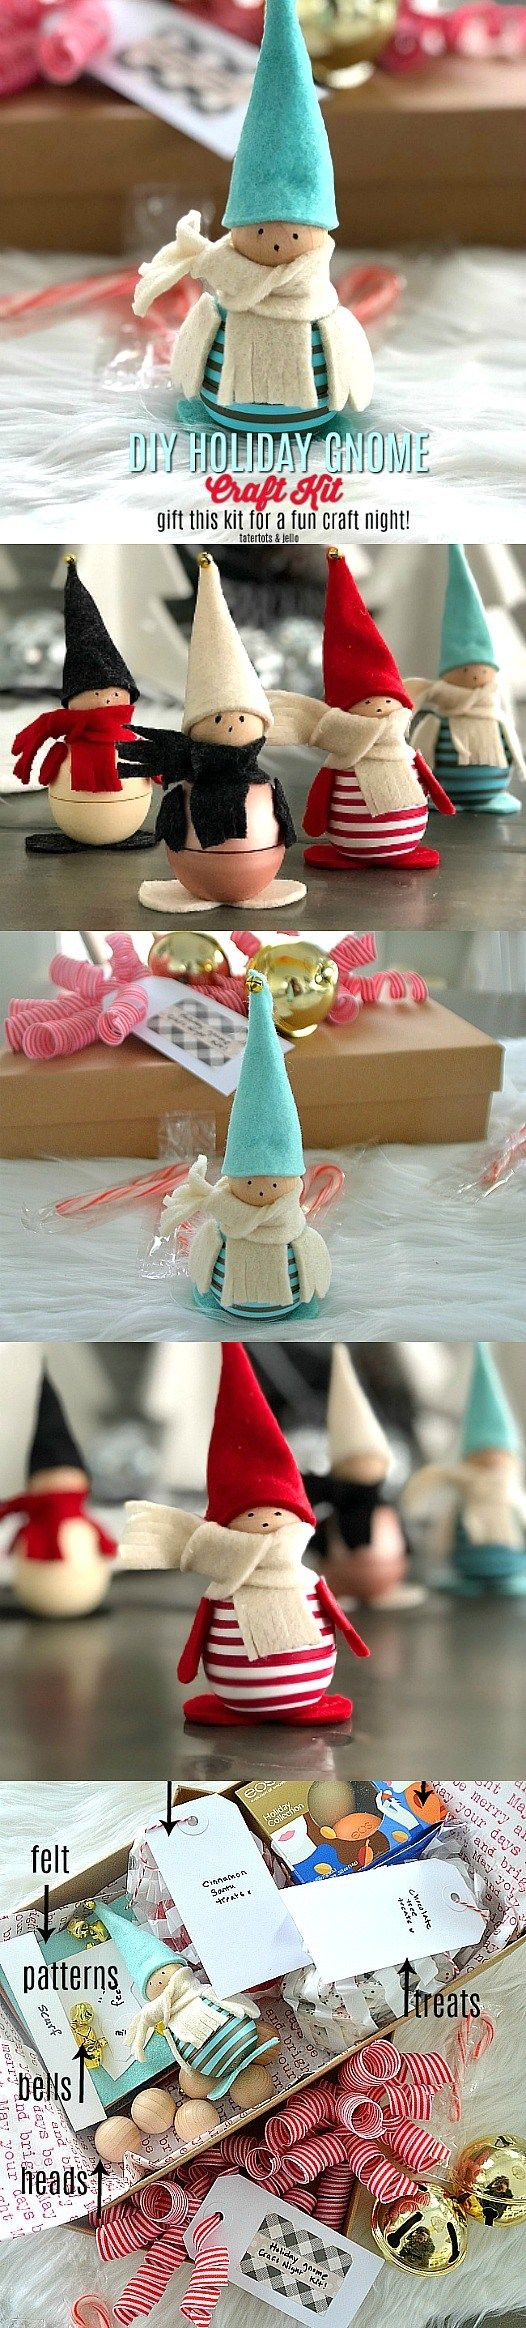 Holiday Gnome Craft Kit - fun craft night idea!